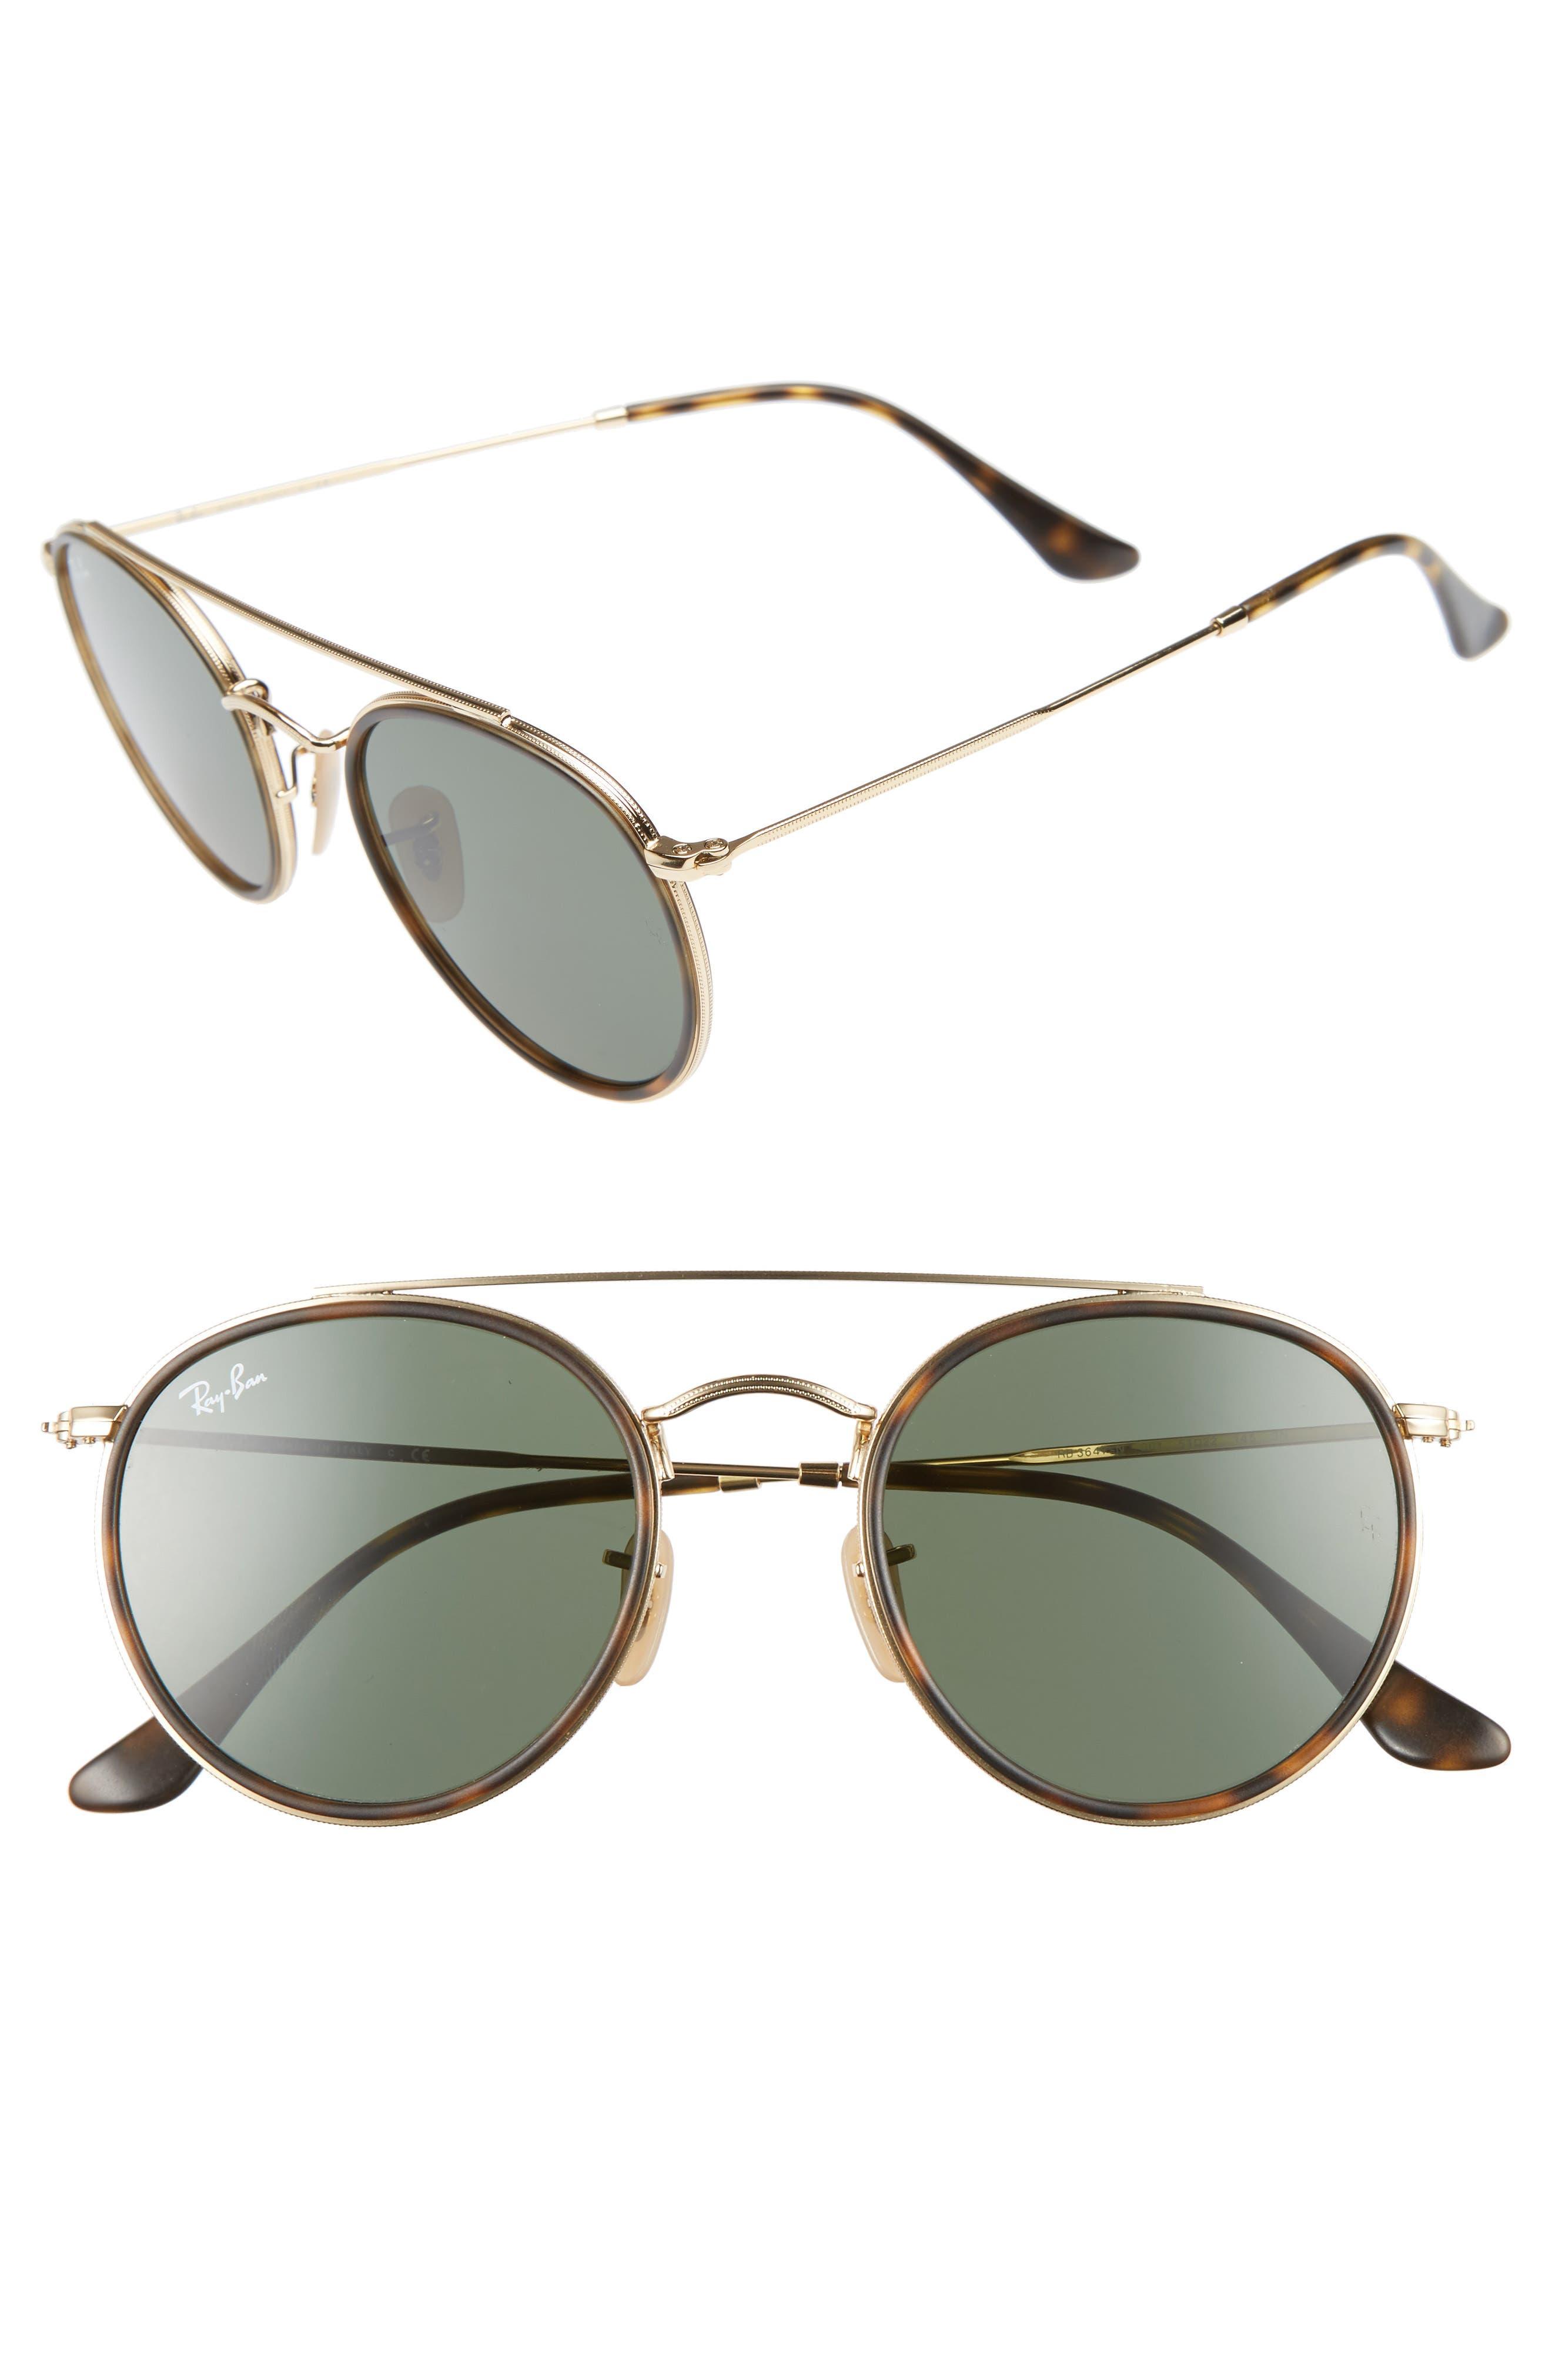 Ray-Ban 51Mm Aviator Sunglasses -